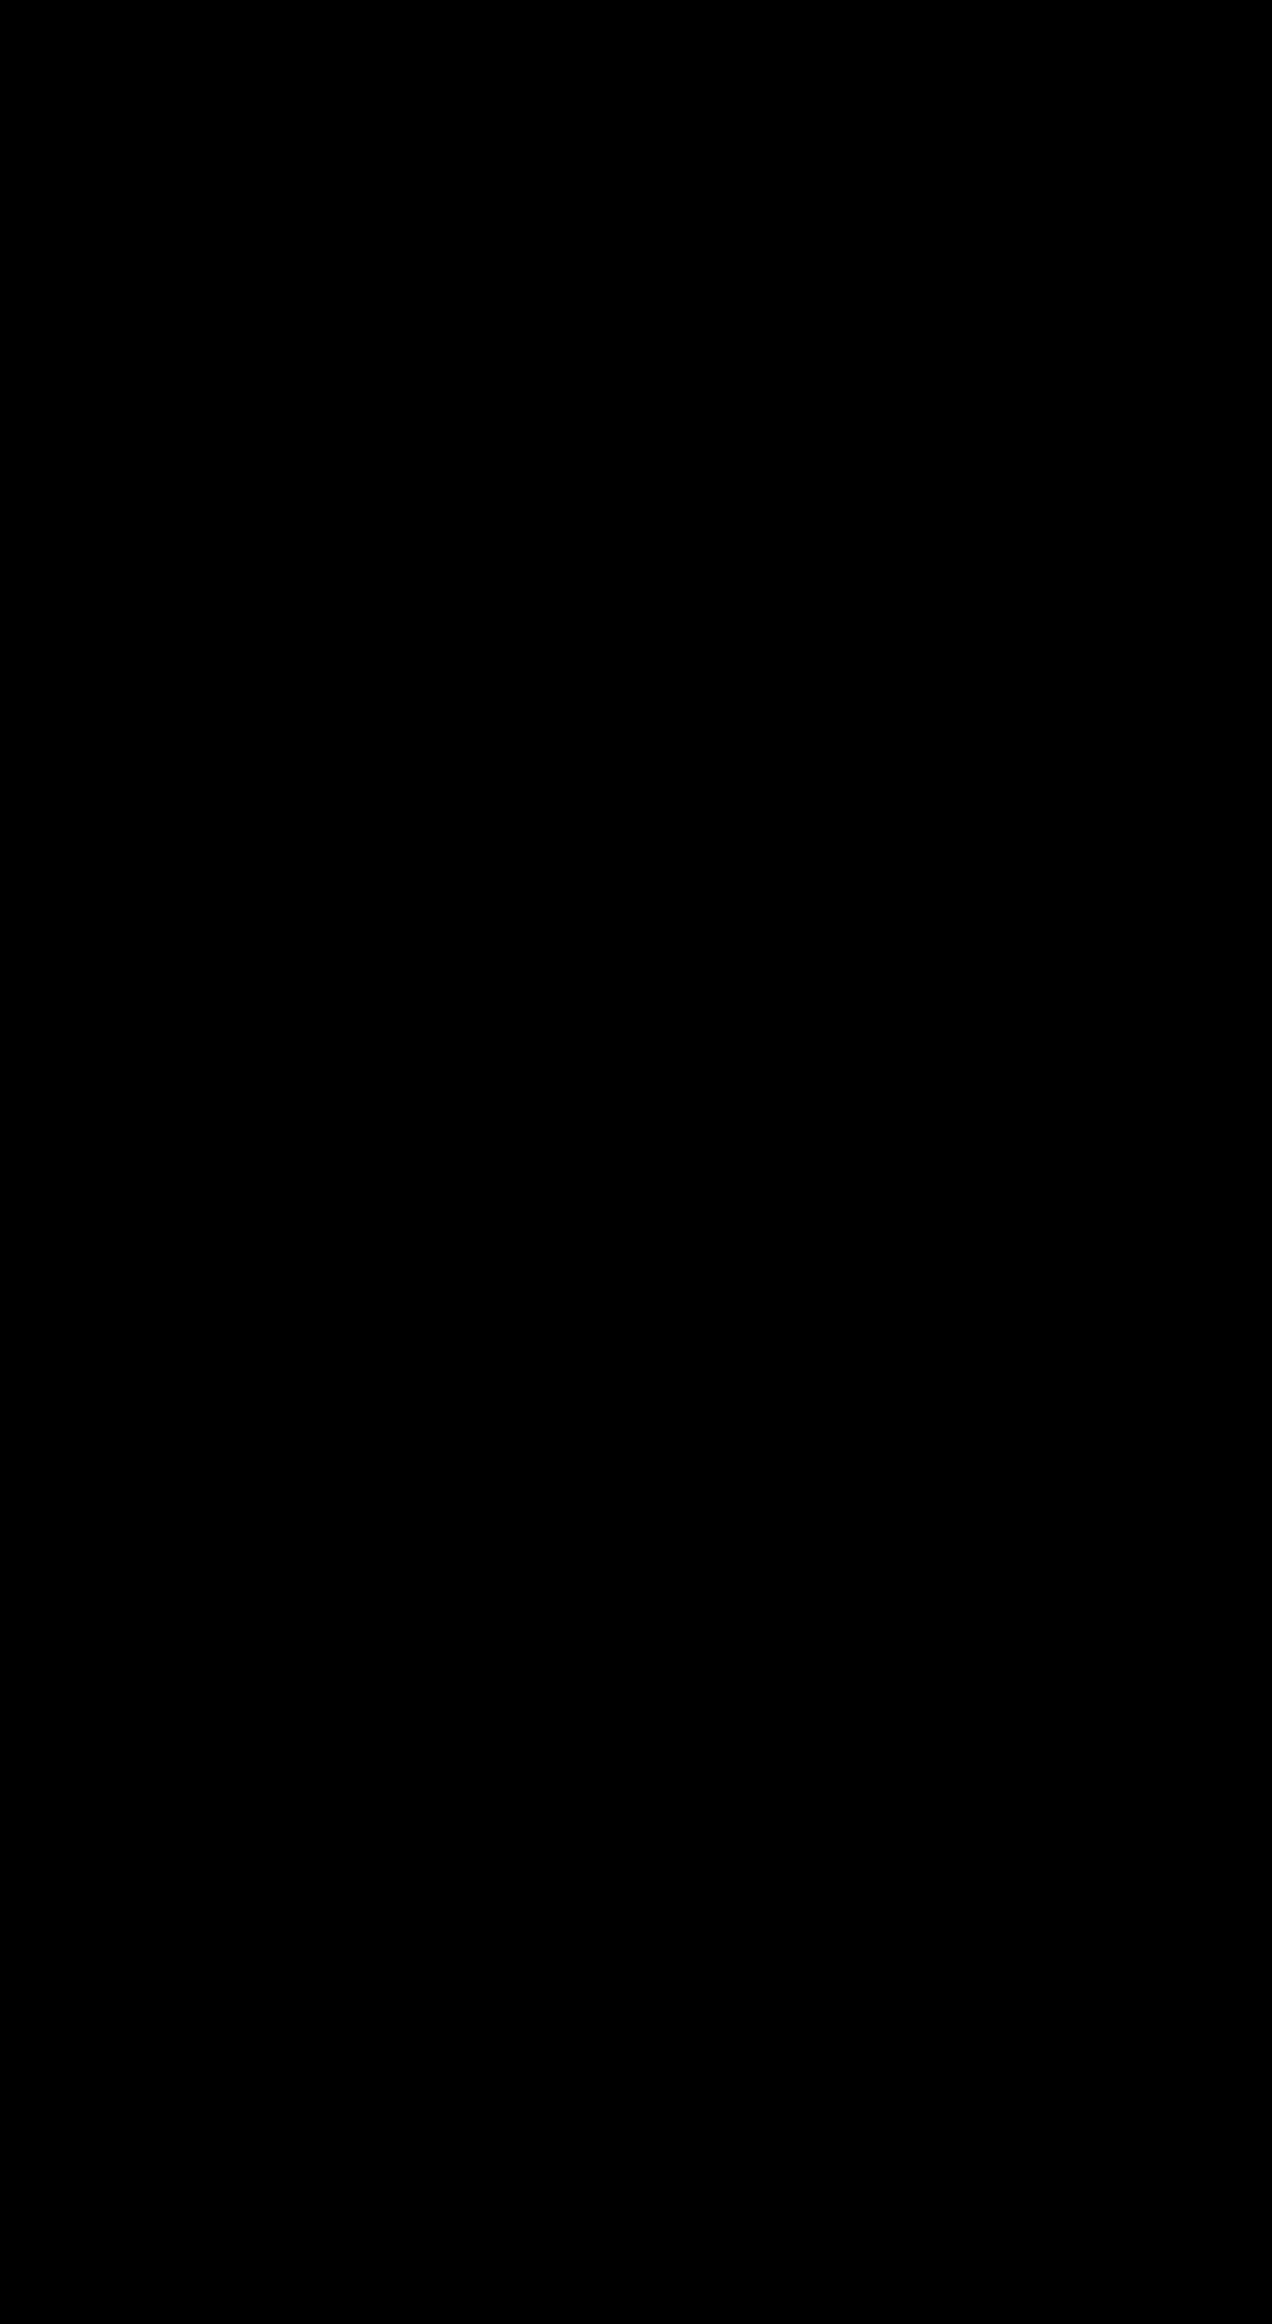 clipart bodybuilder flexing back muscles silhouette make clipart background transparent male clip art images